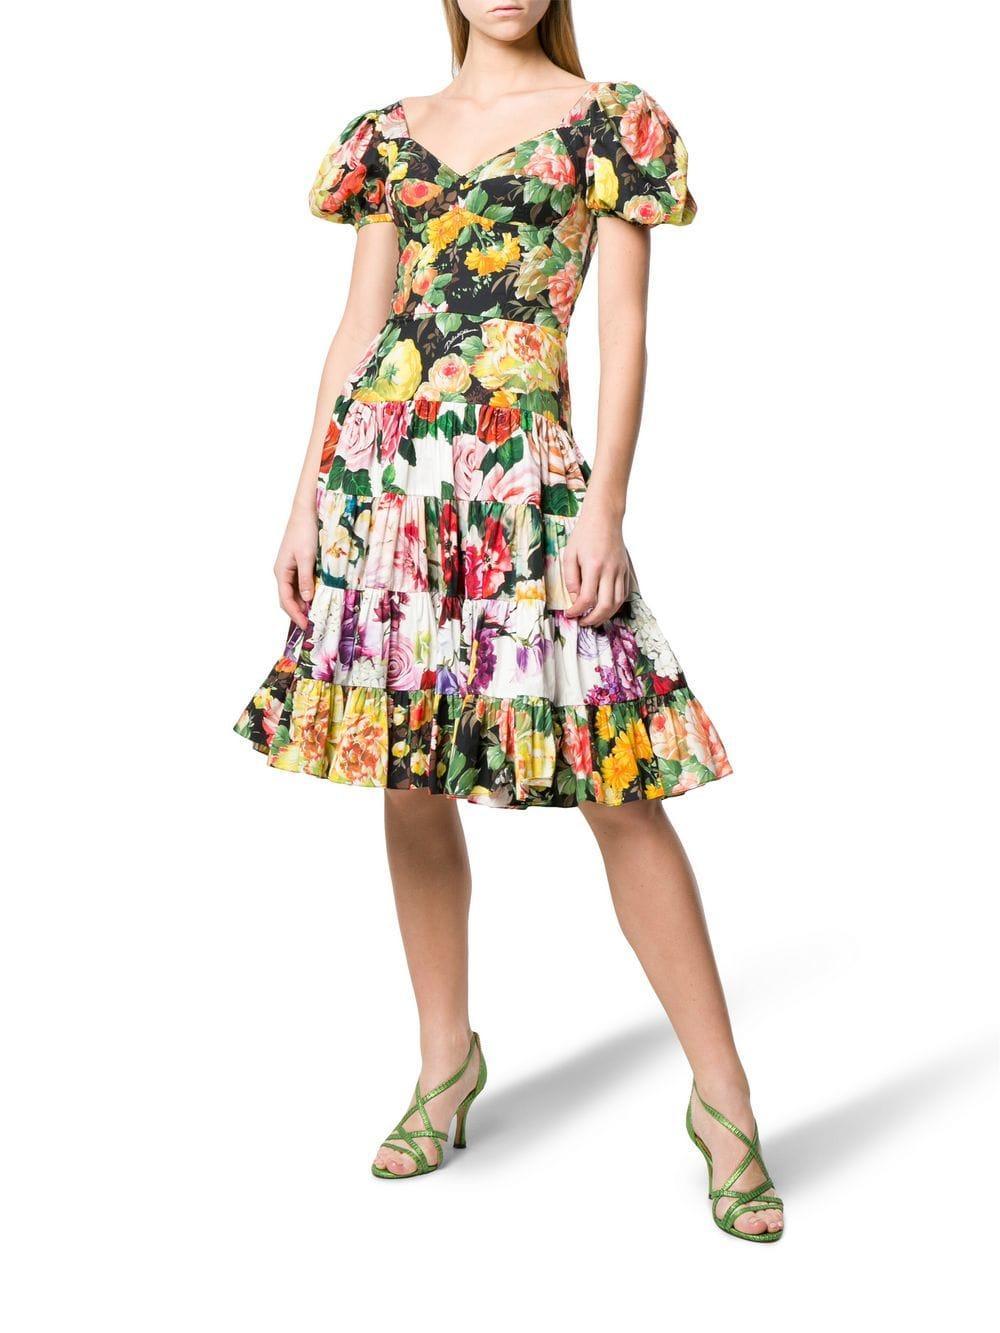 9ece5d87 Dolce & Gabbana - Black Floral Print Flared Dress - Lyst. View fullscreen